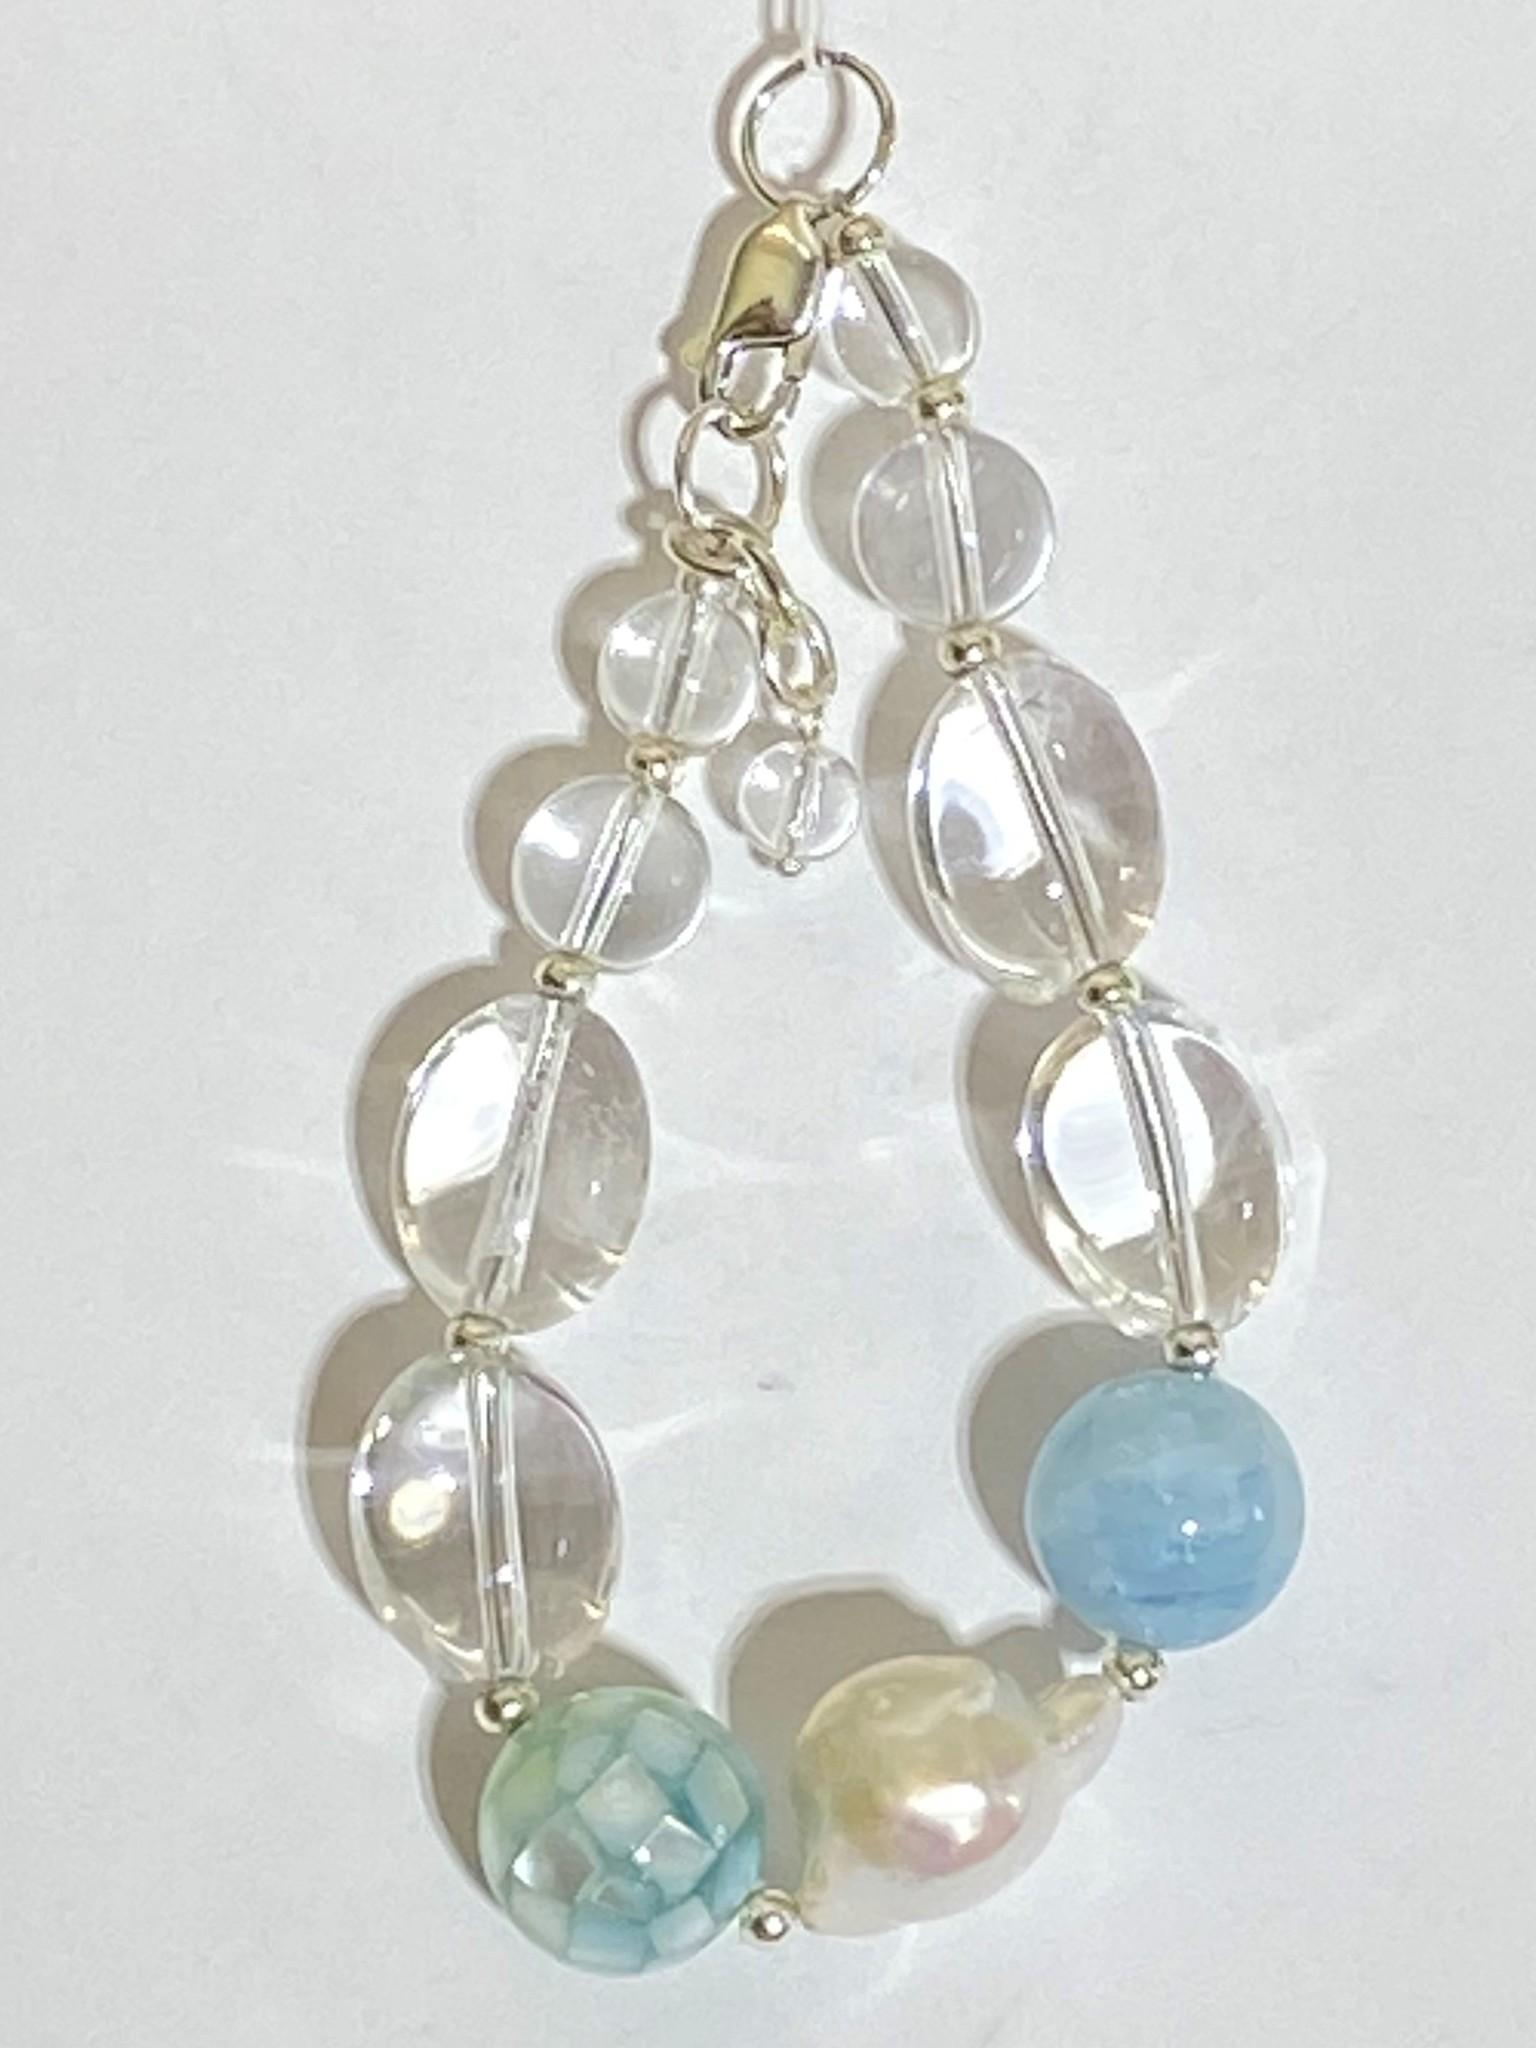 810- хрусталь (браслет из натуральных камней)